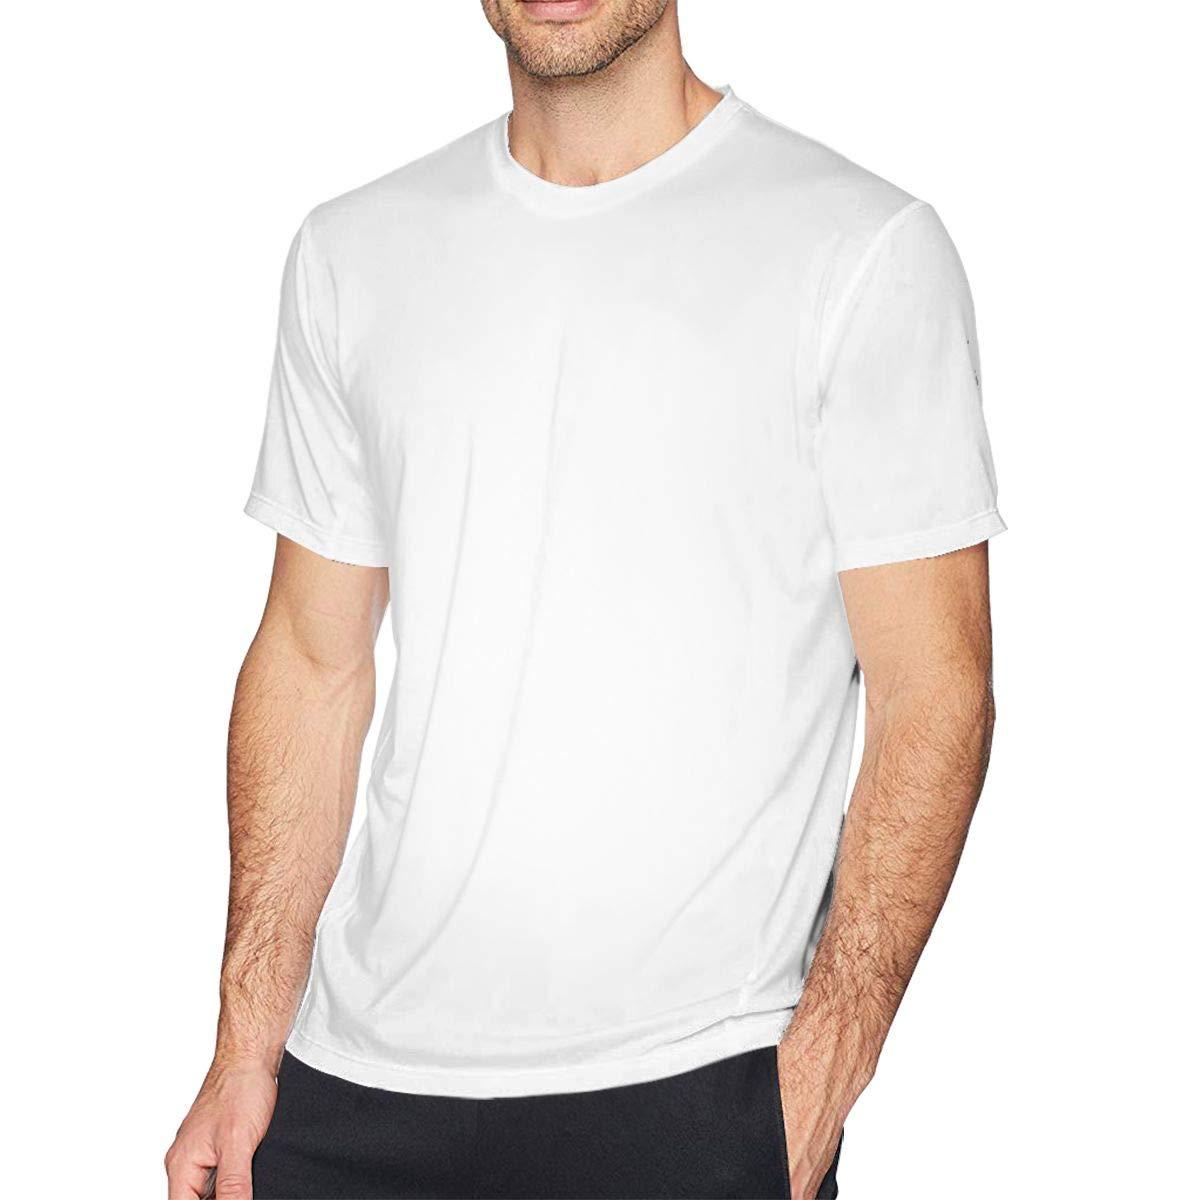 ZlTRNNc Combat Veteran Iraq Afghanistan Mens Shirt Short Sleeve T-Shirt Casual Shirt for Men Teenagers